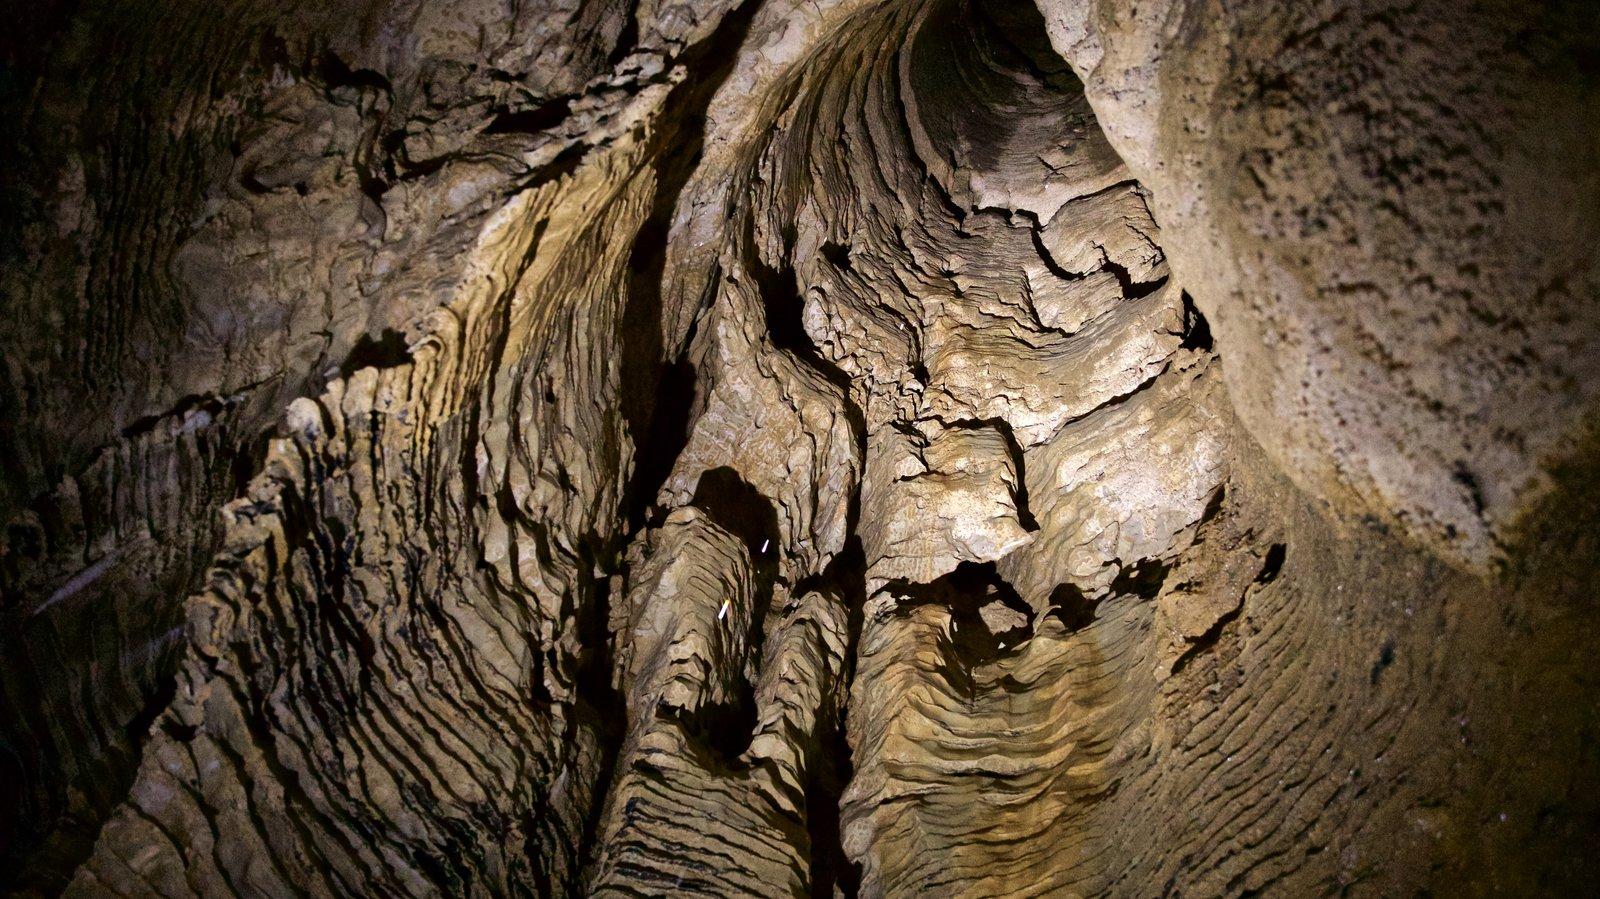 Cavernas de Waitomo caracterizando cavernas